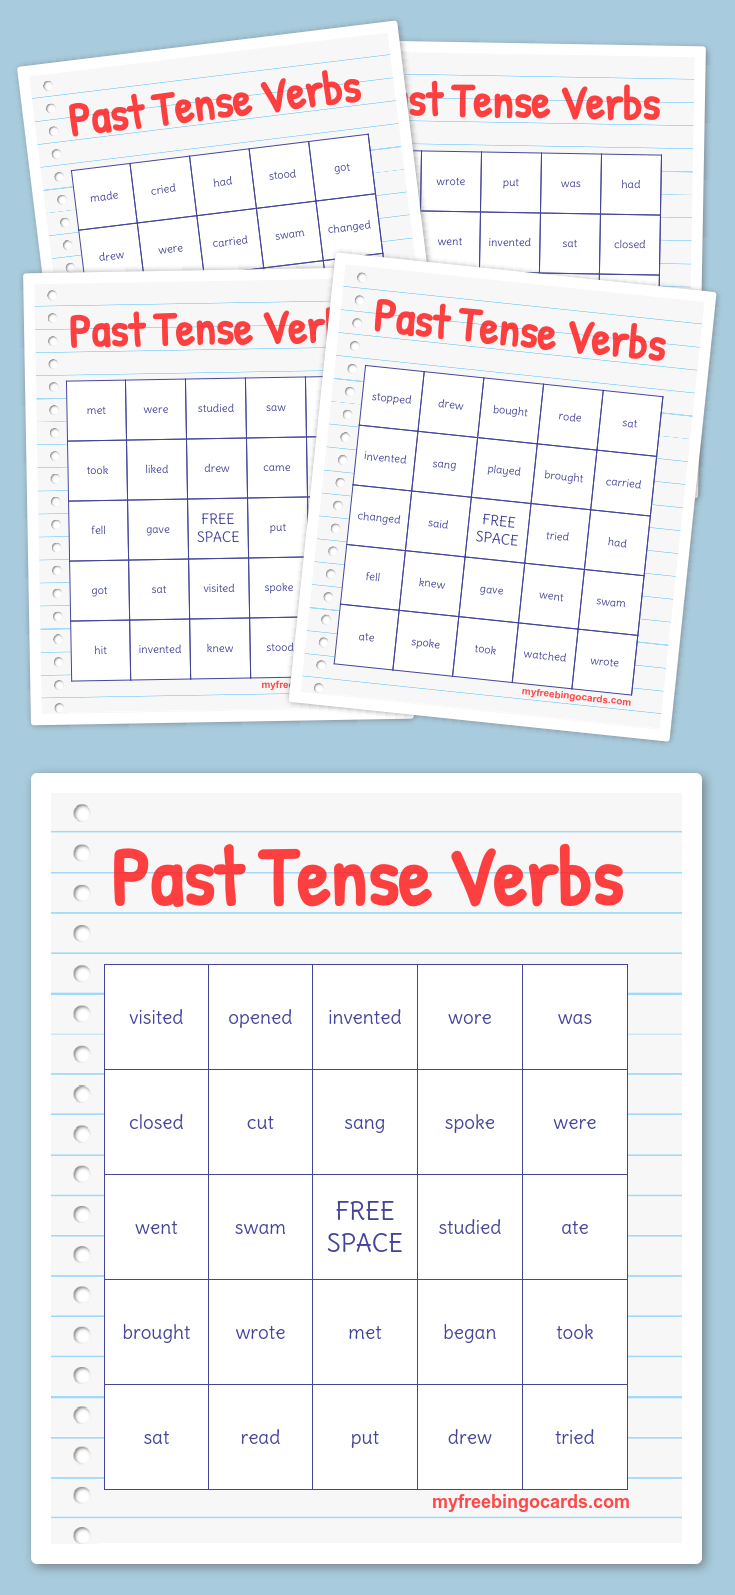 Past Tense Verbs Bingo | Free Bingo Cards, Free Printable